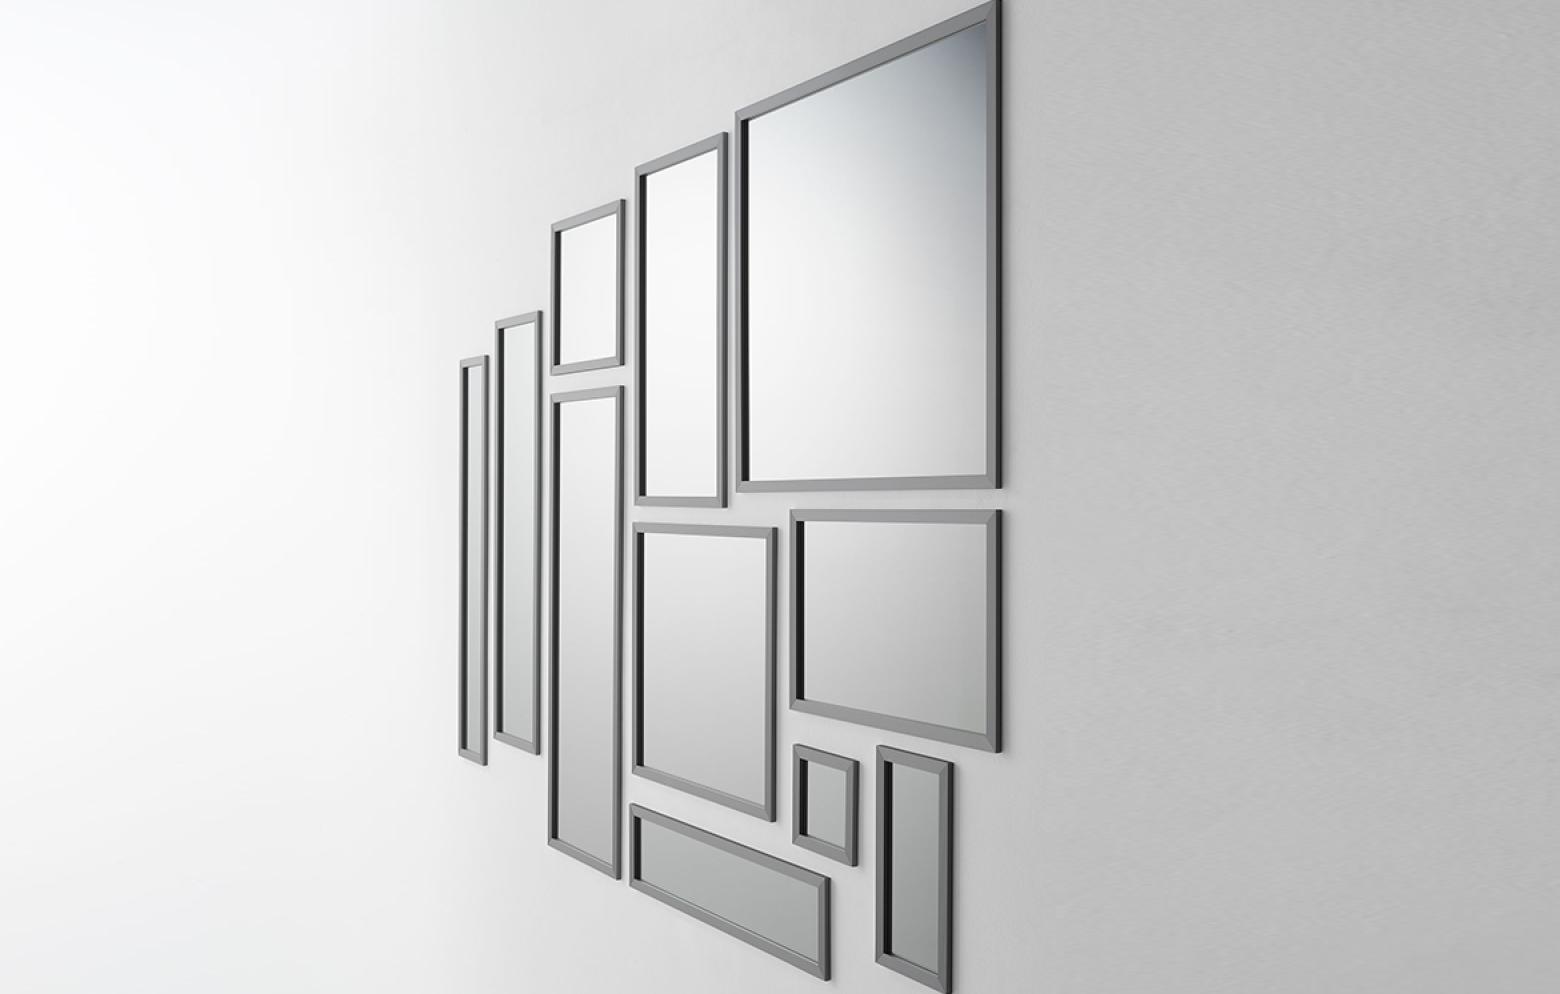 Wandspiegel ute bei who 39 s perfect kaufen - Specchio a parete ...